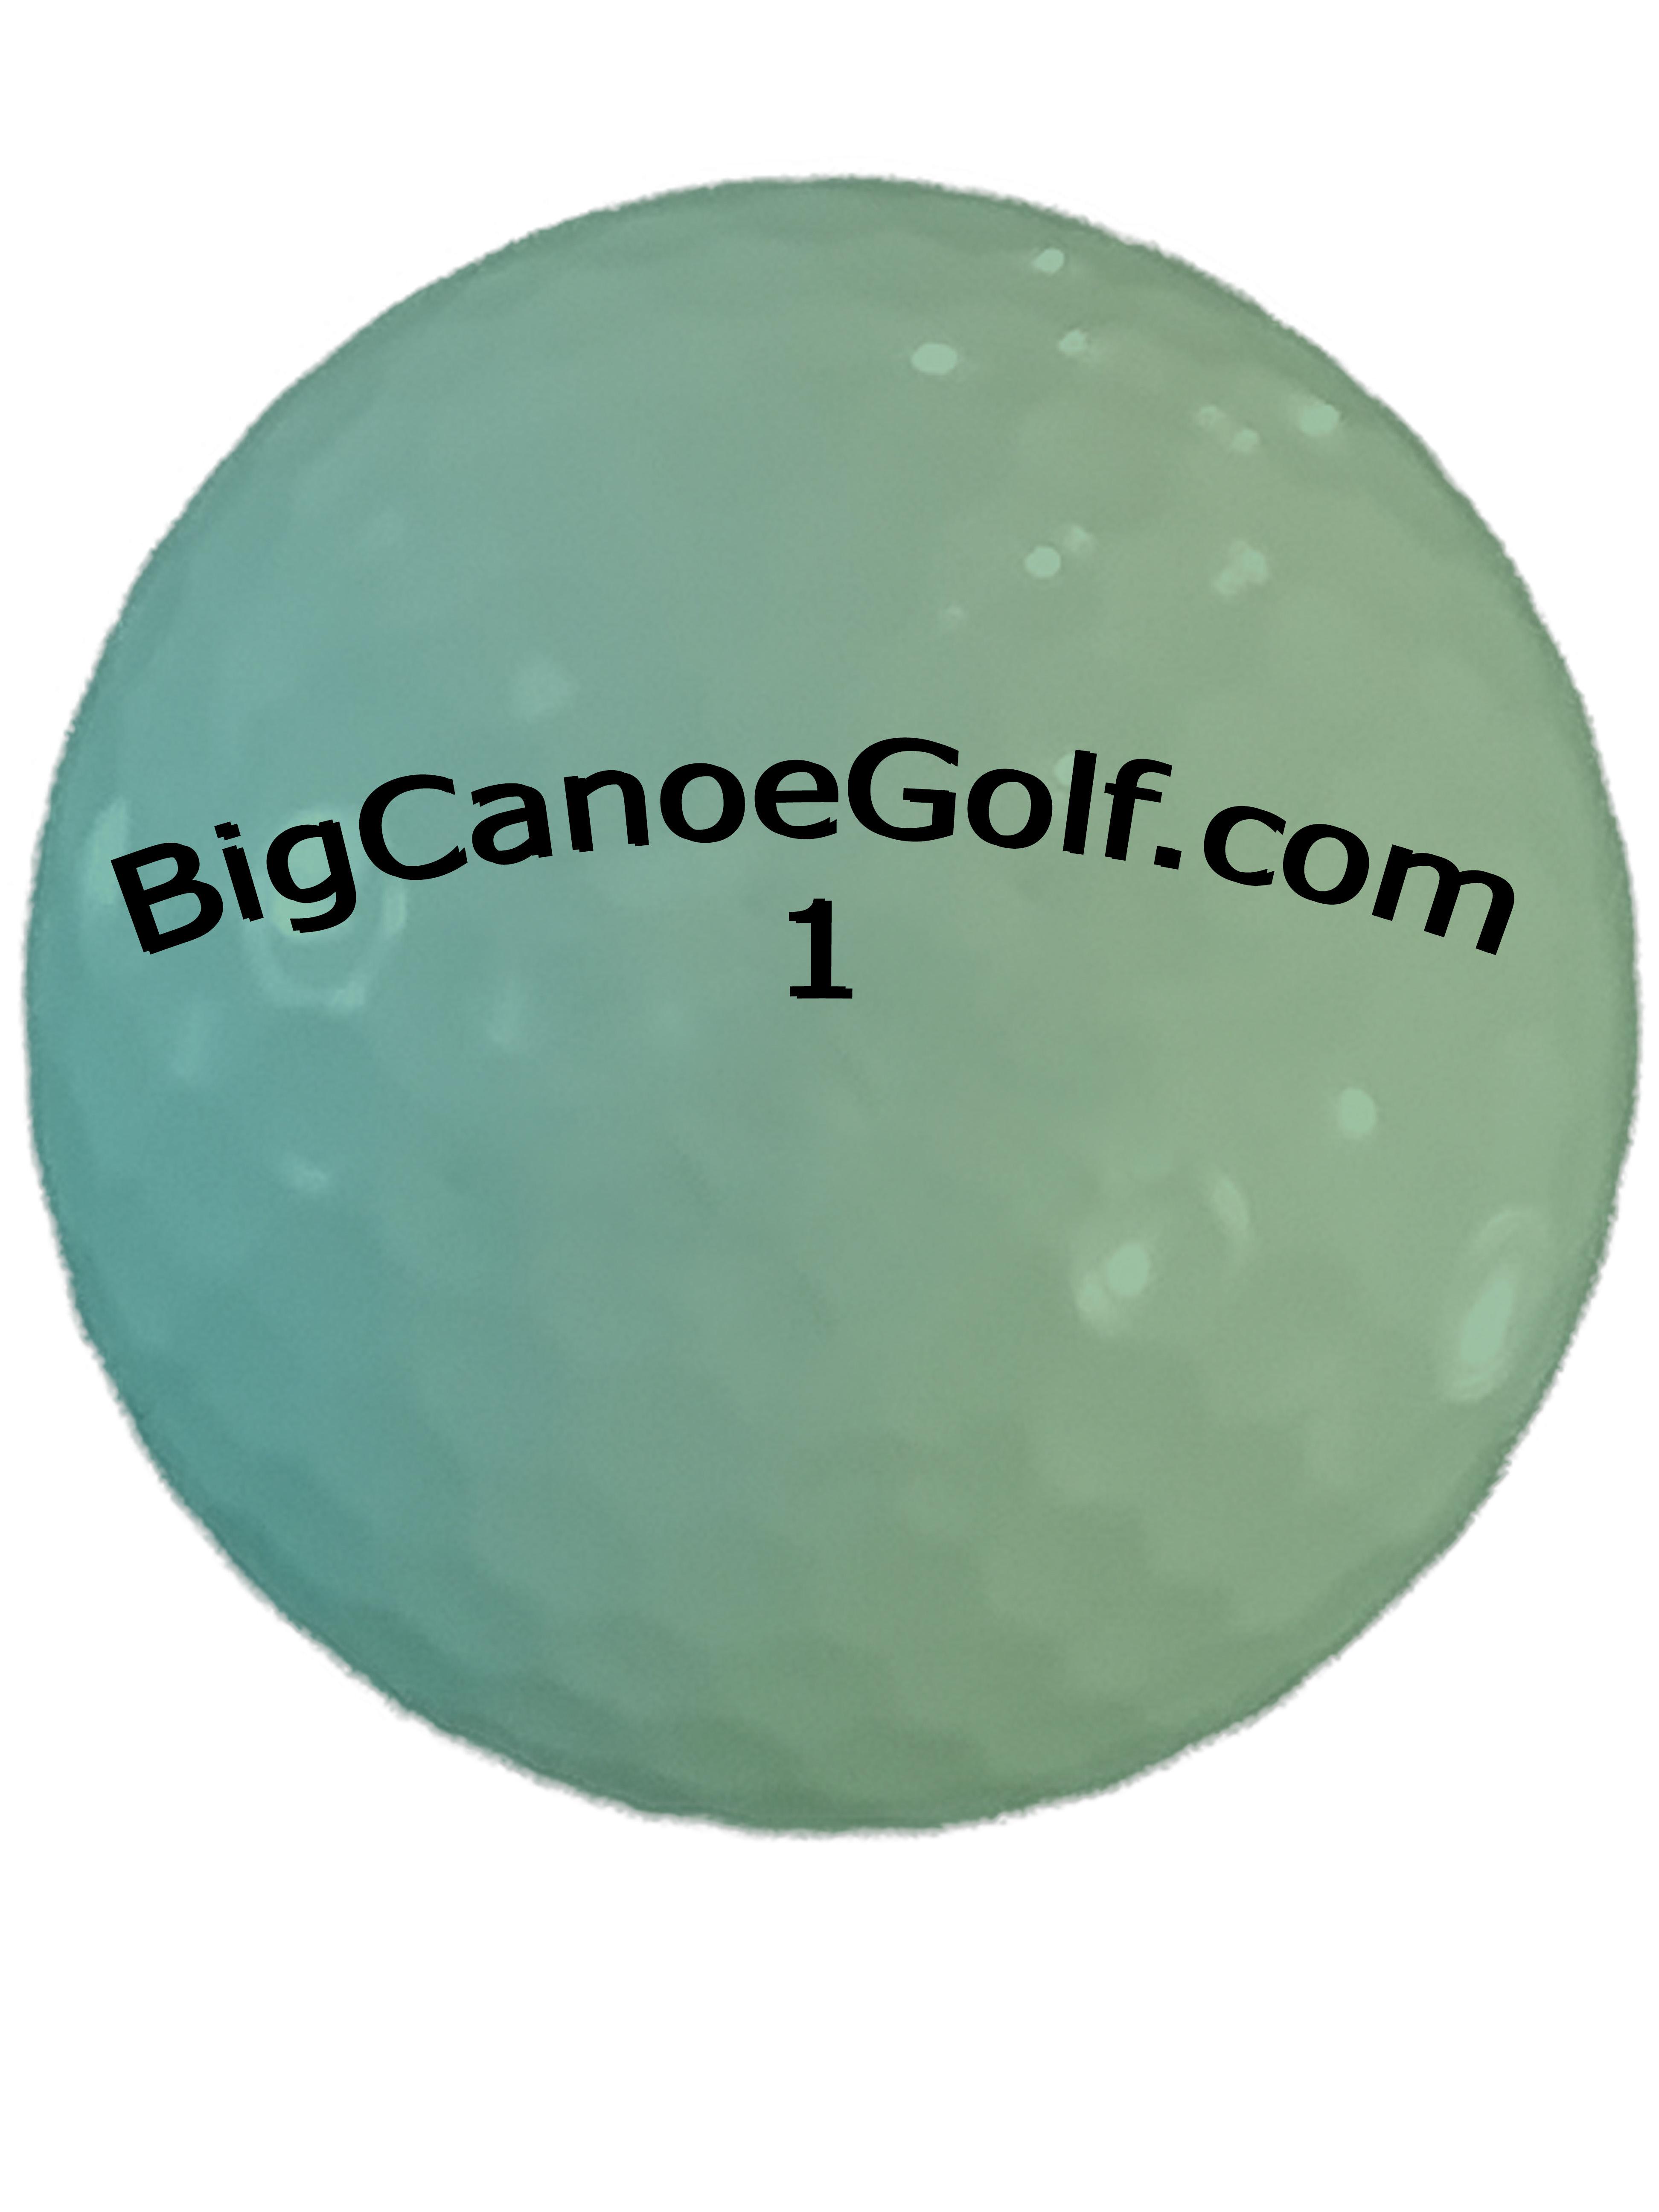 BigCanoeGolf.com